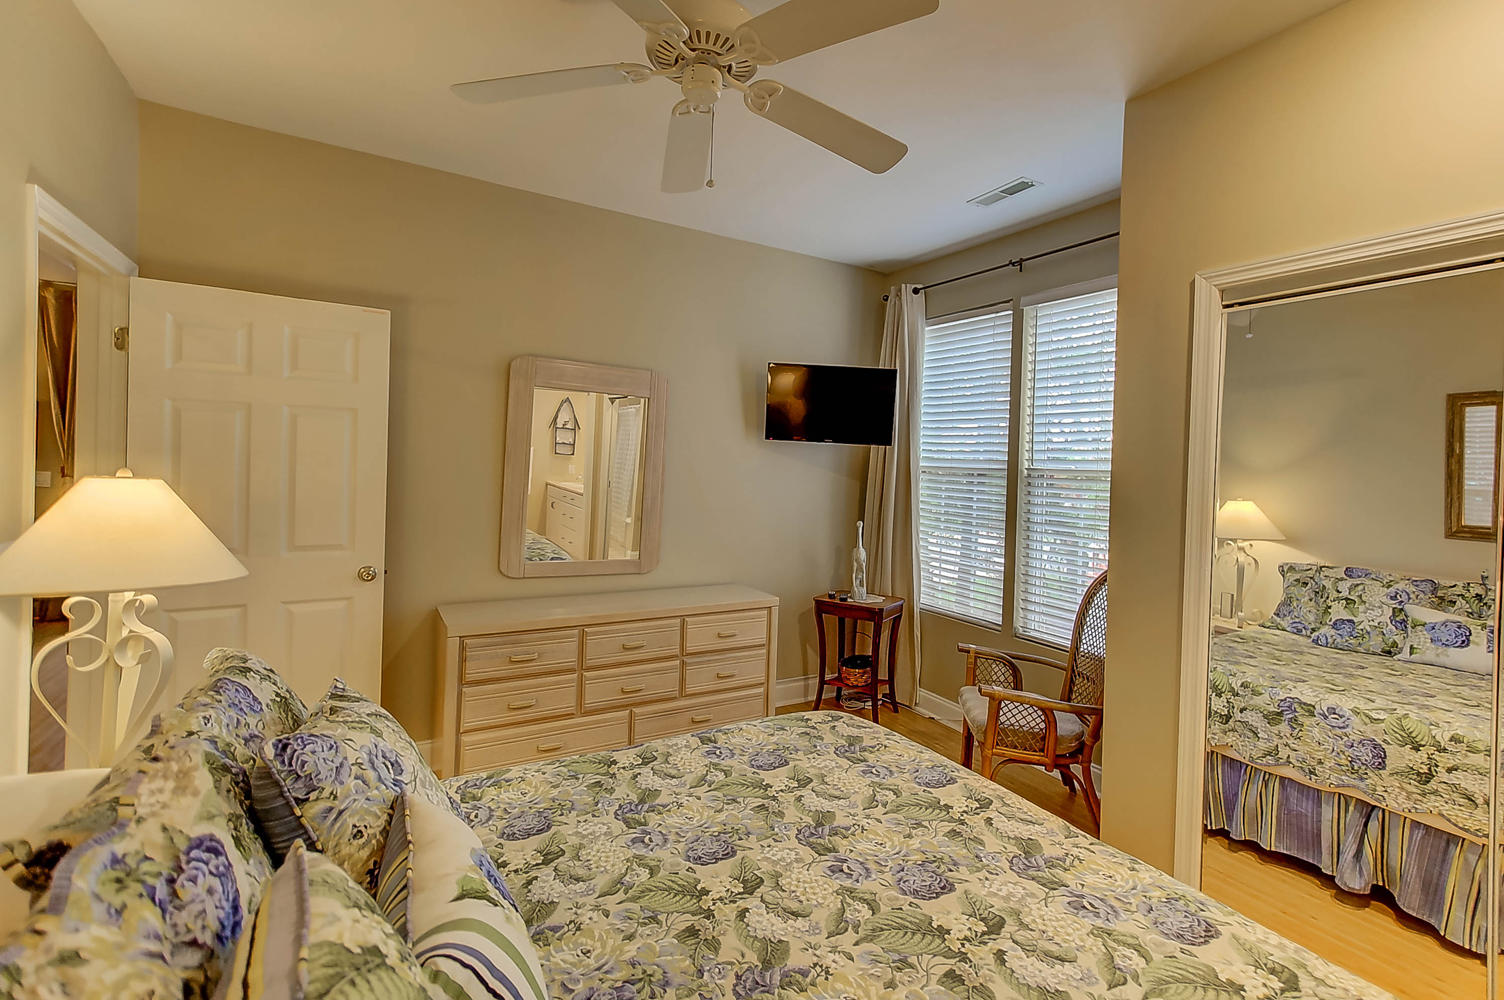 Beachwalker Villas Homes For Sale - 108 Ashley, Folly Beach, SC - 8